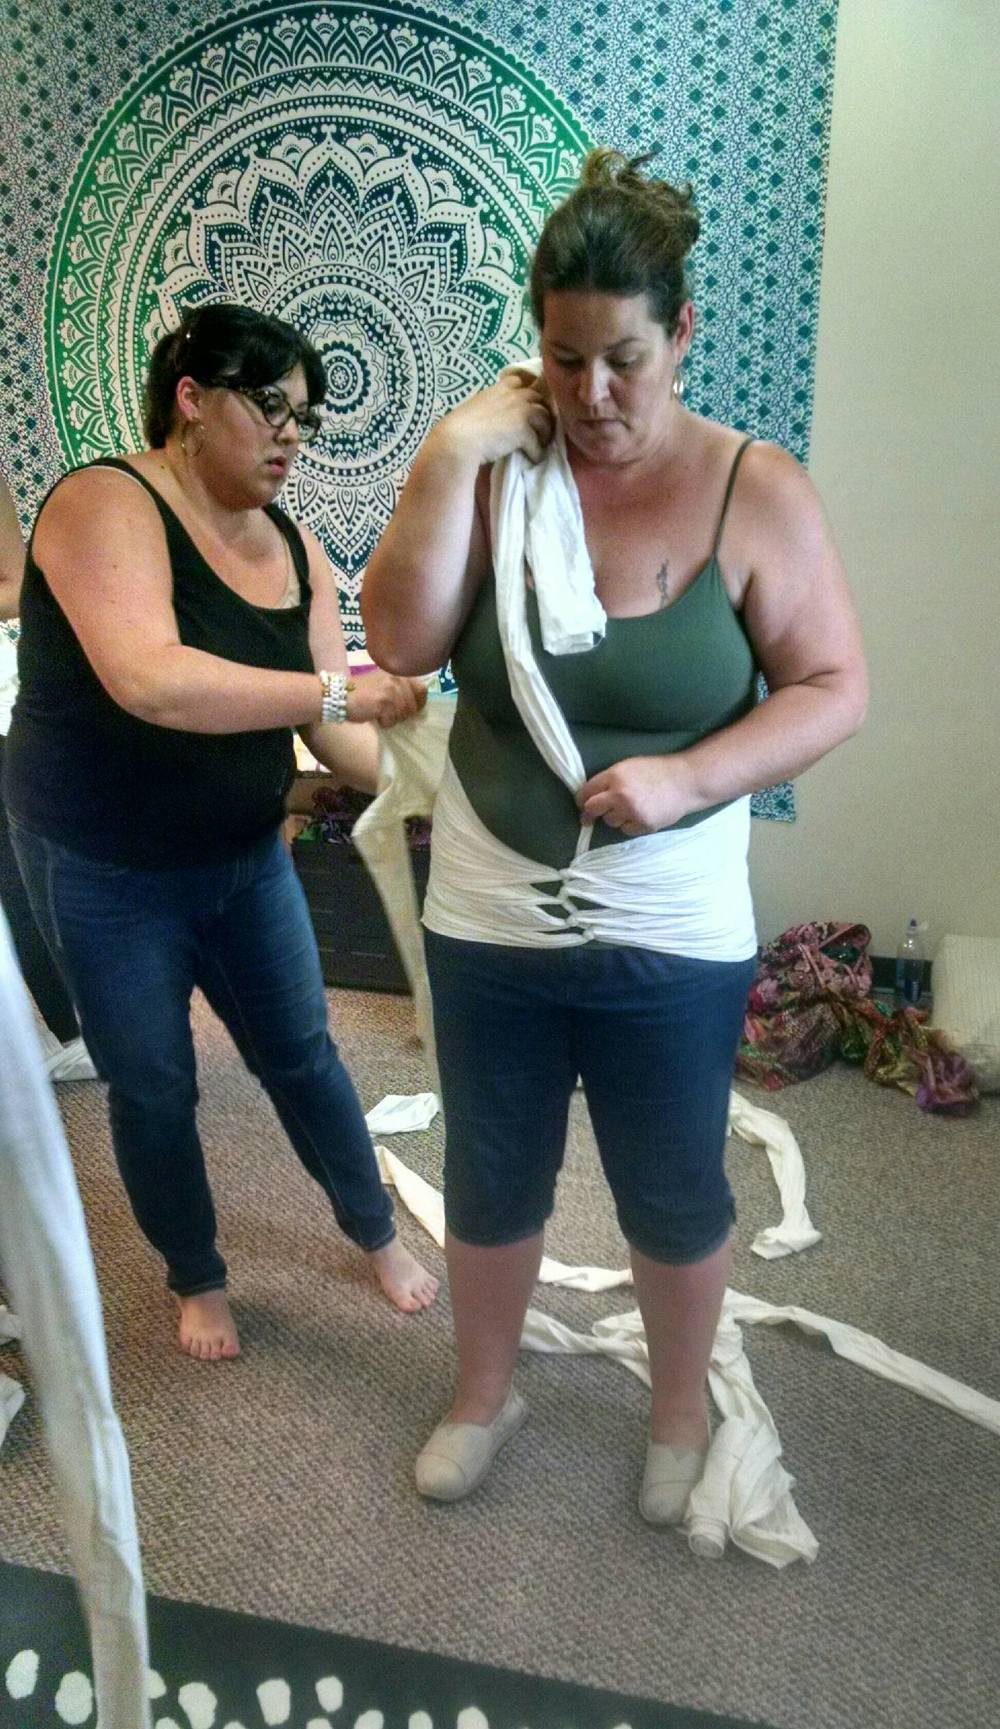 Trainer Devon Mullins demonstrates Bengkung Belly Binding